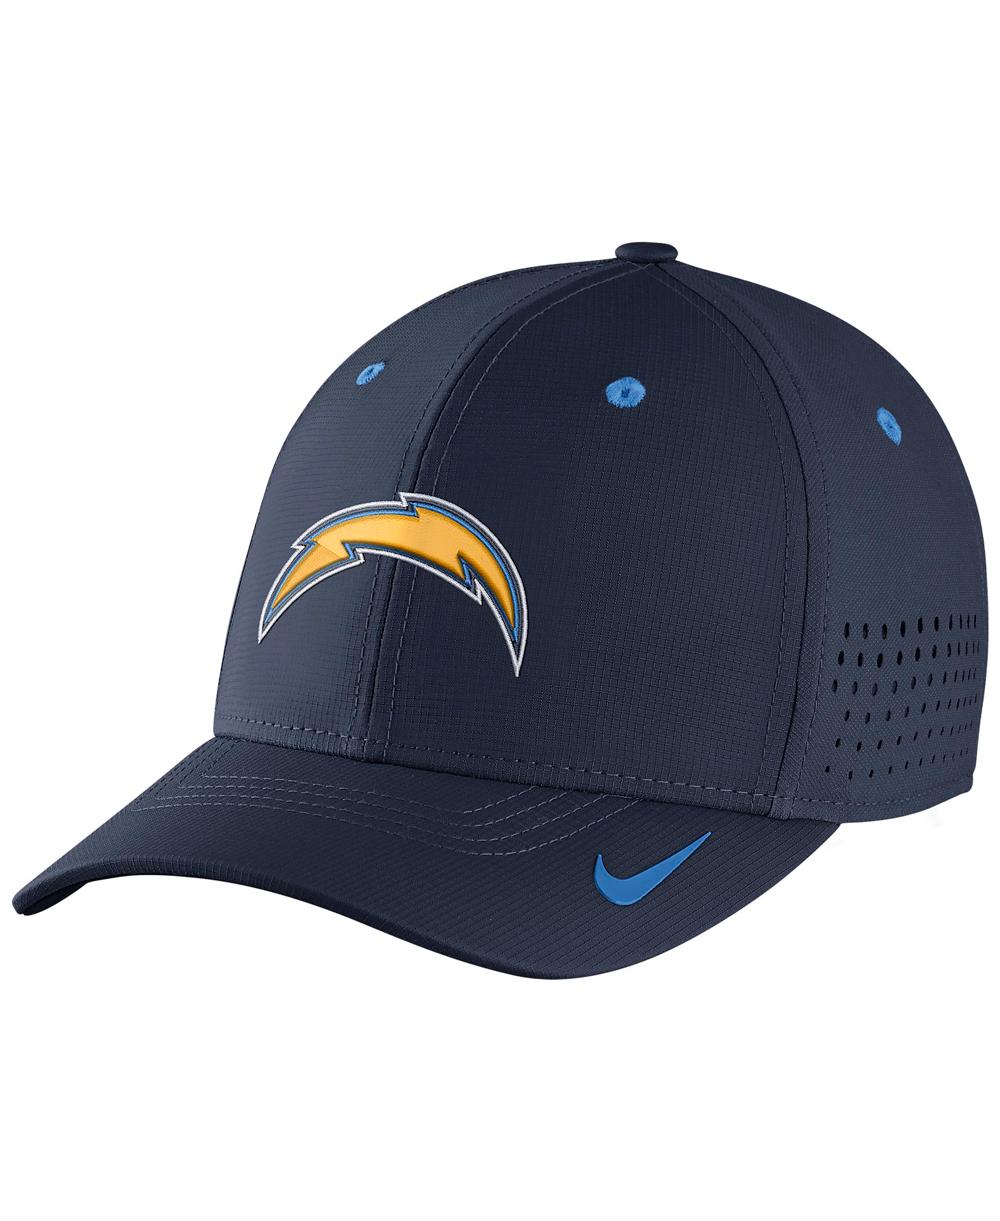 NFL Chargers Flex Legacy Swoosh Herren Cap Vapor E2IDH9